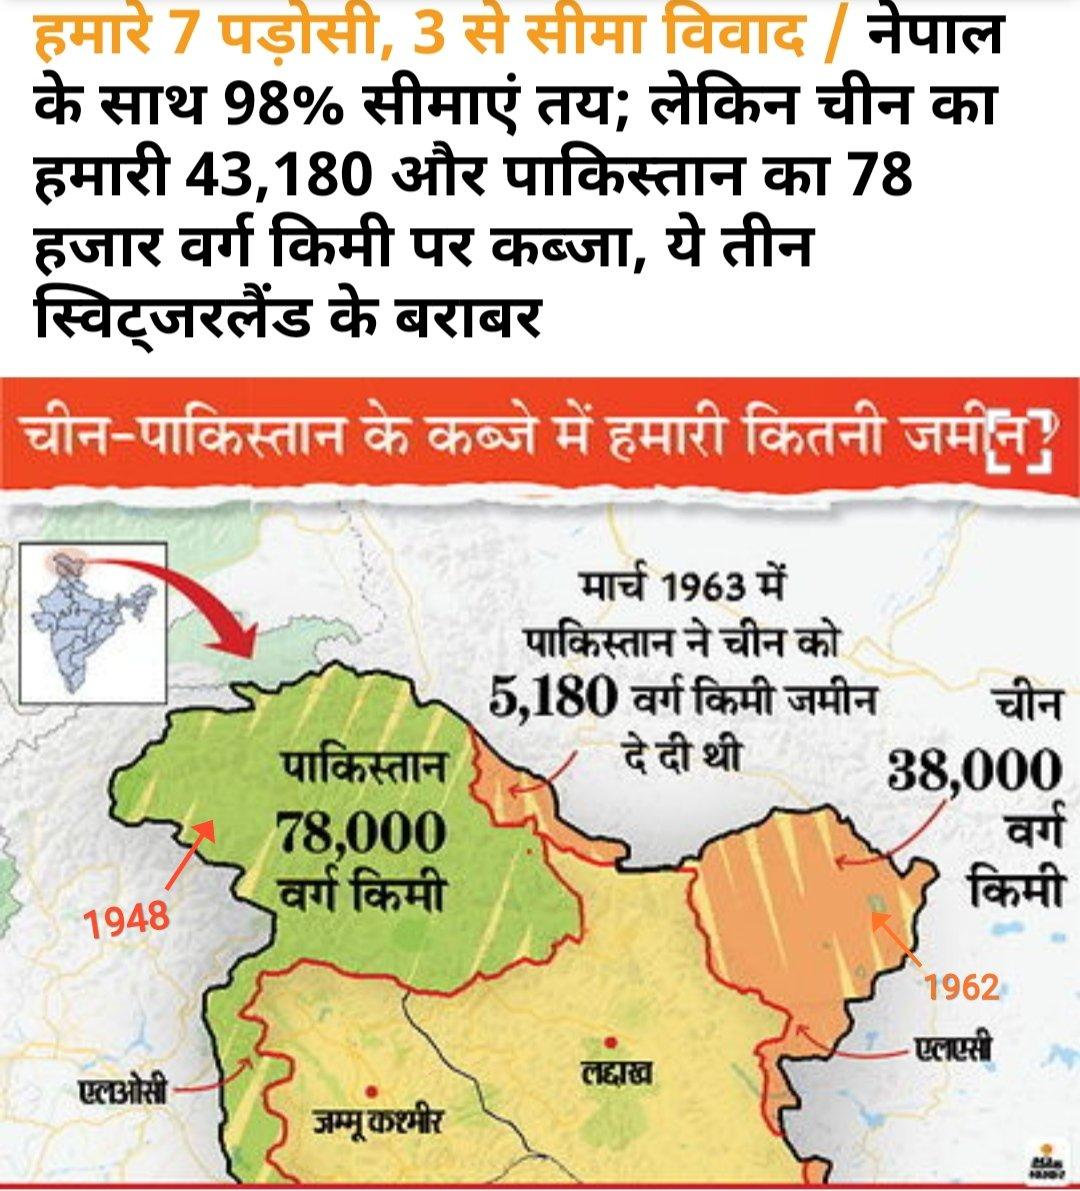 PoK 78000 sq/km + Shagsgam Valley 5,180 sq/km+ Aksai Chin 38,000 sq/km = 1 लाख 21 हज़ार 180 वर्ग किलोमीटर।गलवान का हिसाब मांग रहे इसका हिसाब कब देंगे? @INCIndia @BJP4India @JM_Scindia @rajneesh4n @RahulGandhi @PMOIndia @ManishTewari @RSSorg @ShivSena @amitjogi #chinaindiaborder https://t.co/qPghsampAY